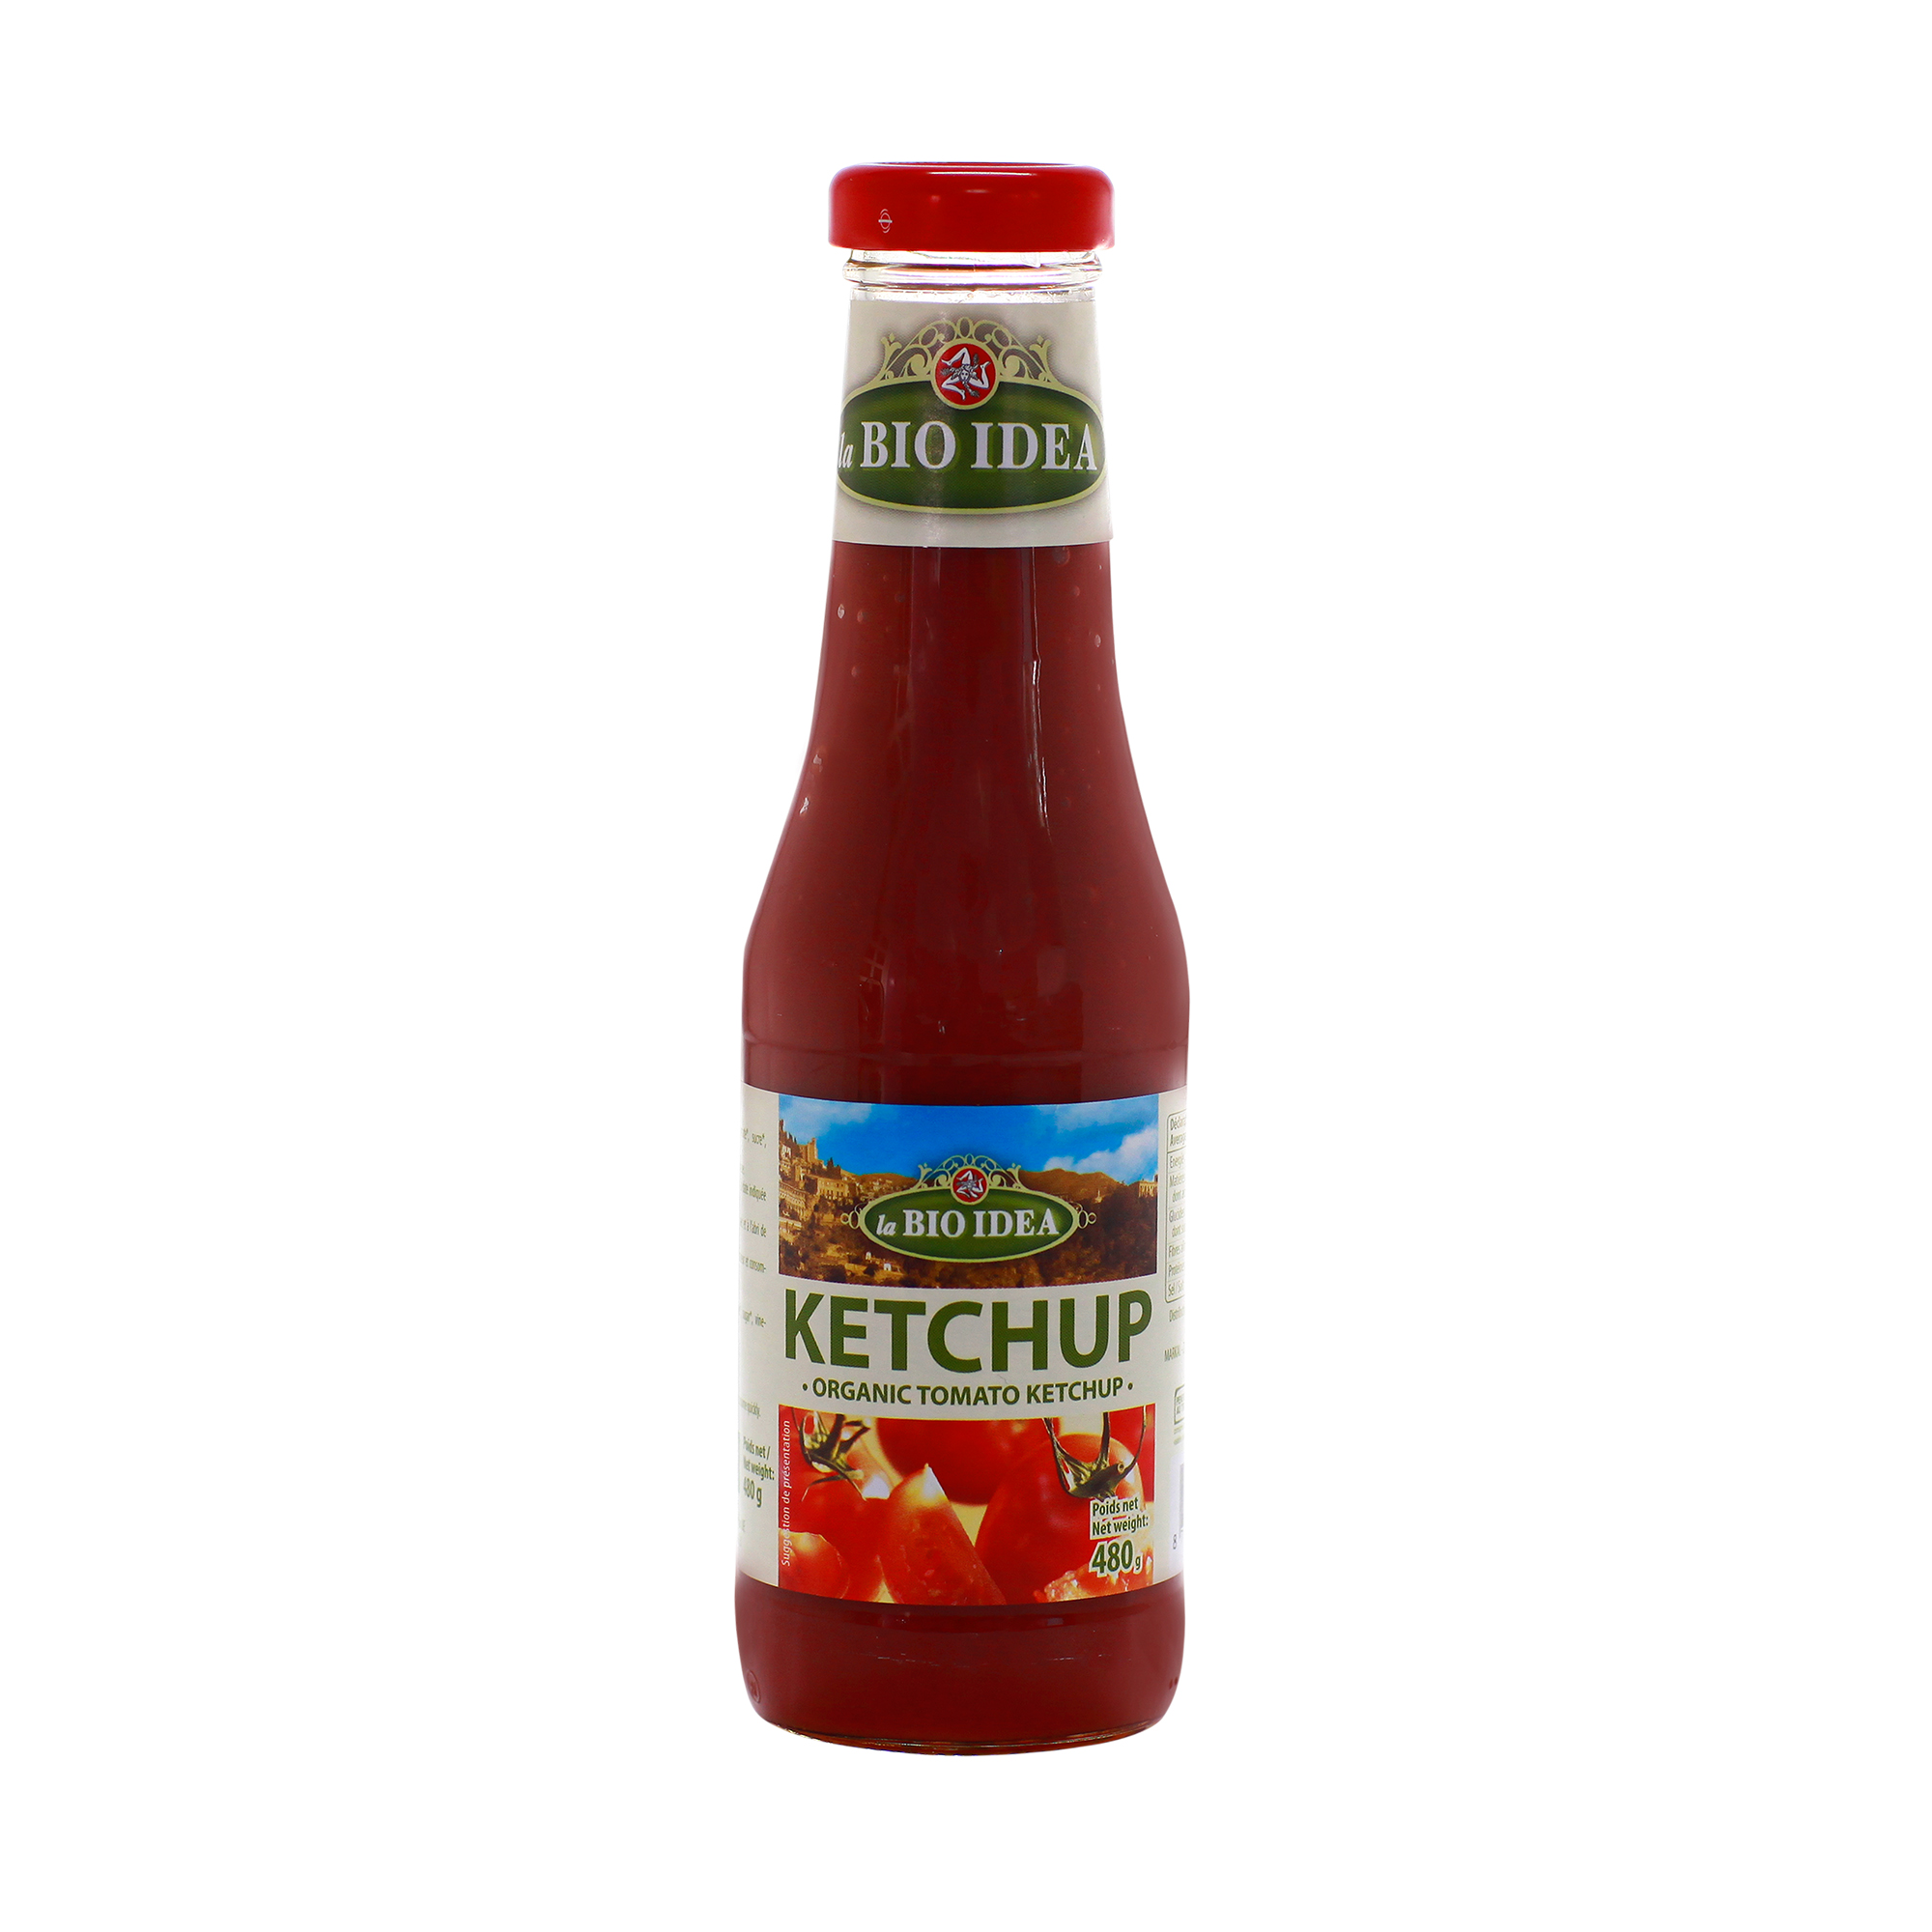 Sốt tương cà ketchup hữu cơ Bio Idea 480g